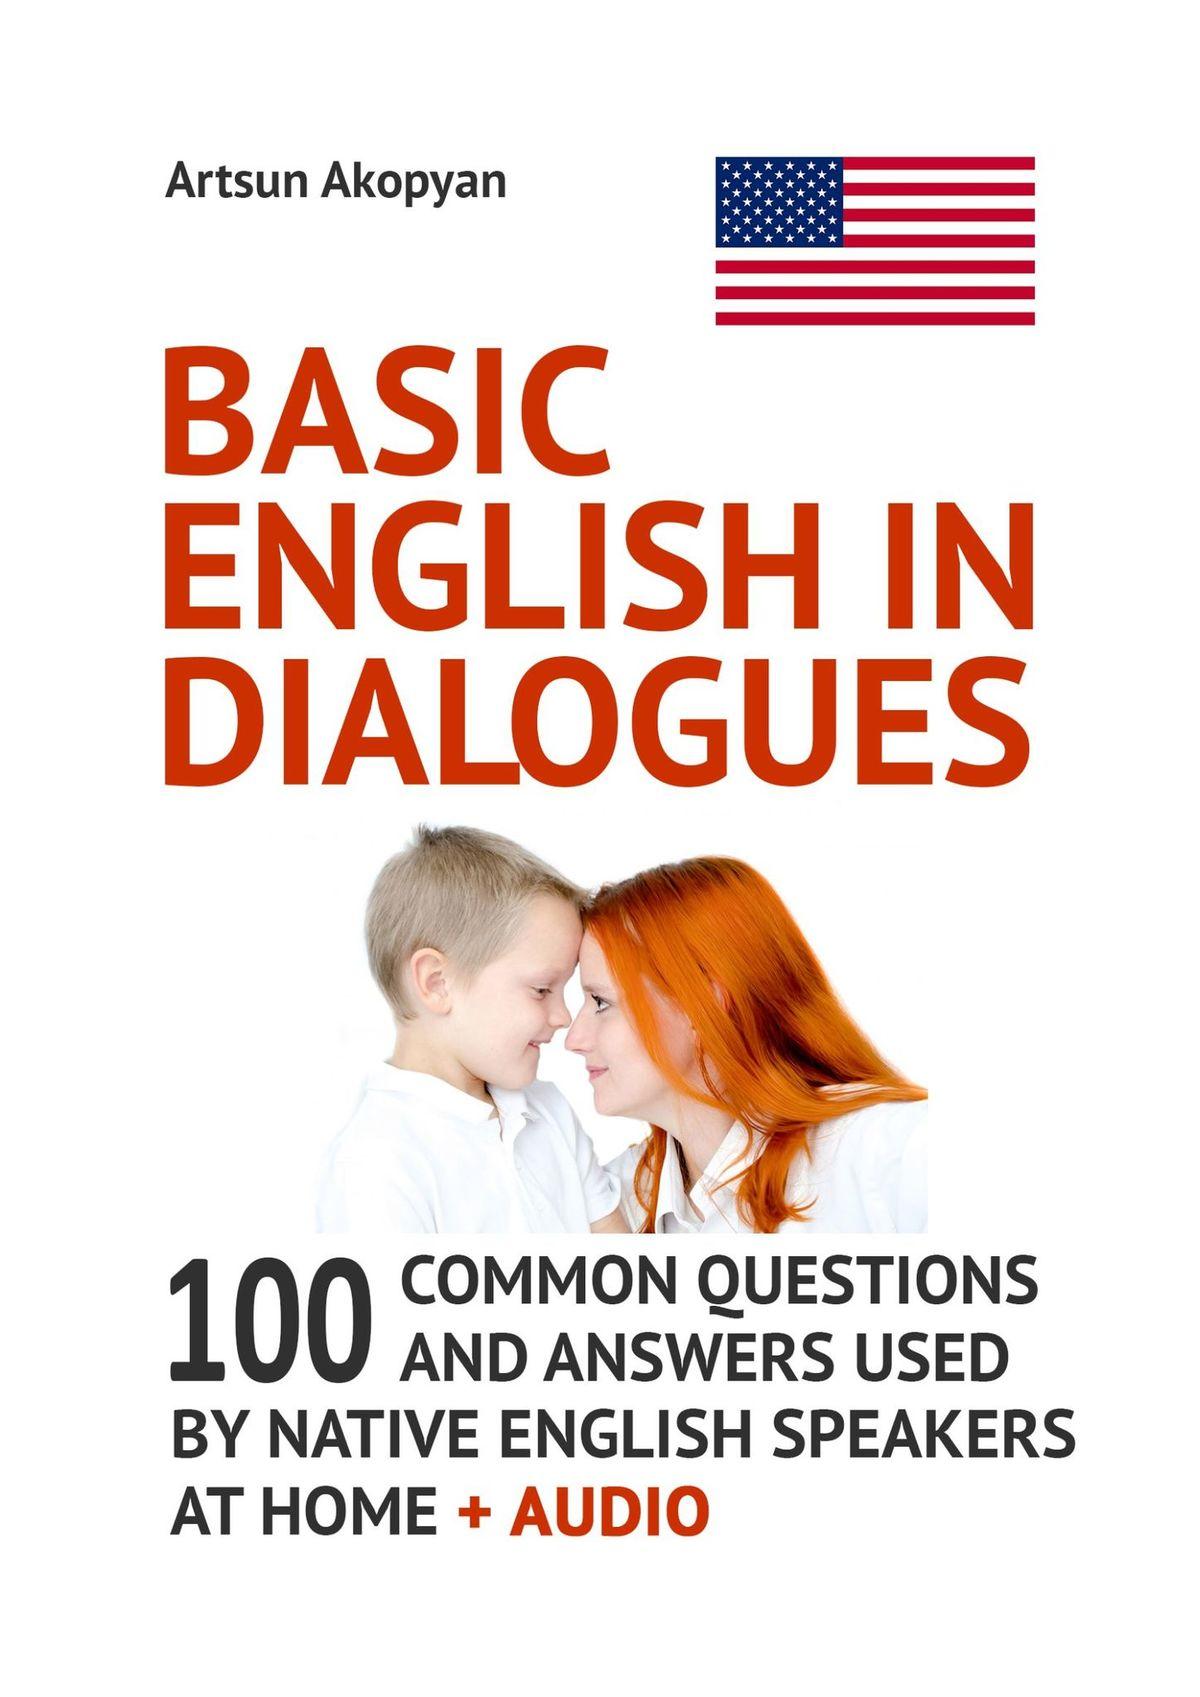 Dialogues inEnglish atHome